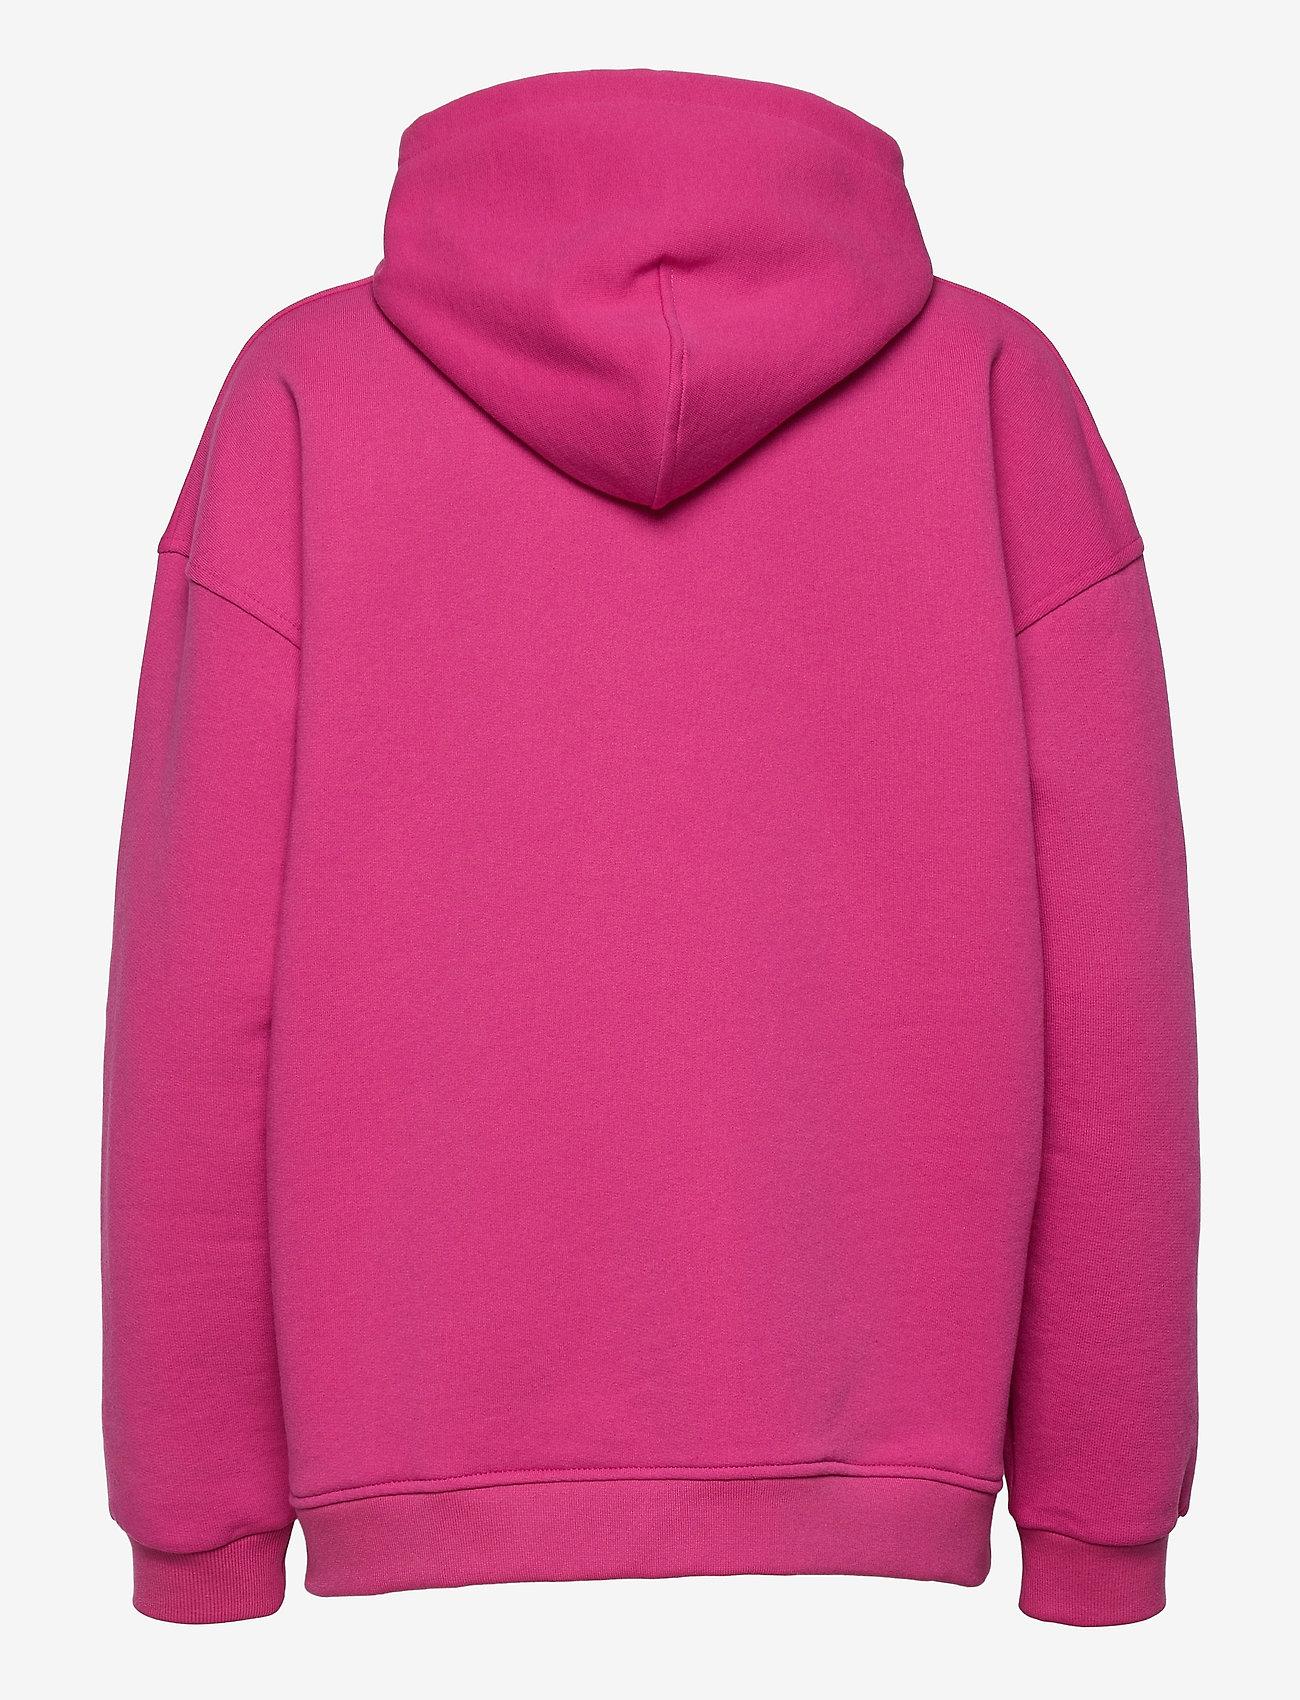 Ganni - Software Isoli - sweatshirts & hoodies - shocking pink - 1